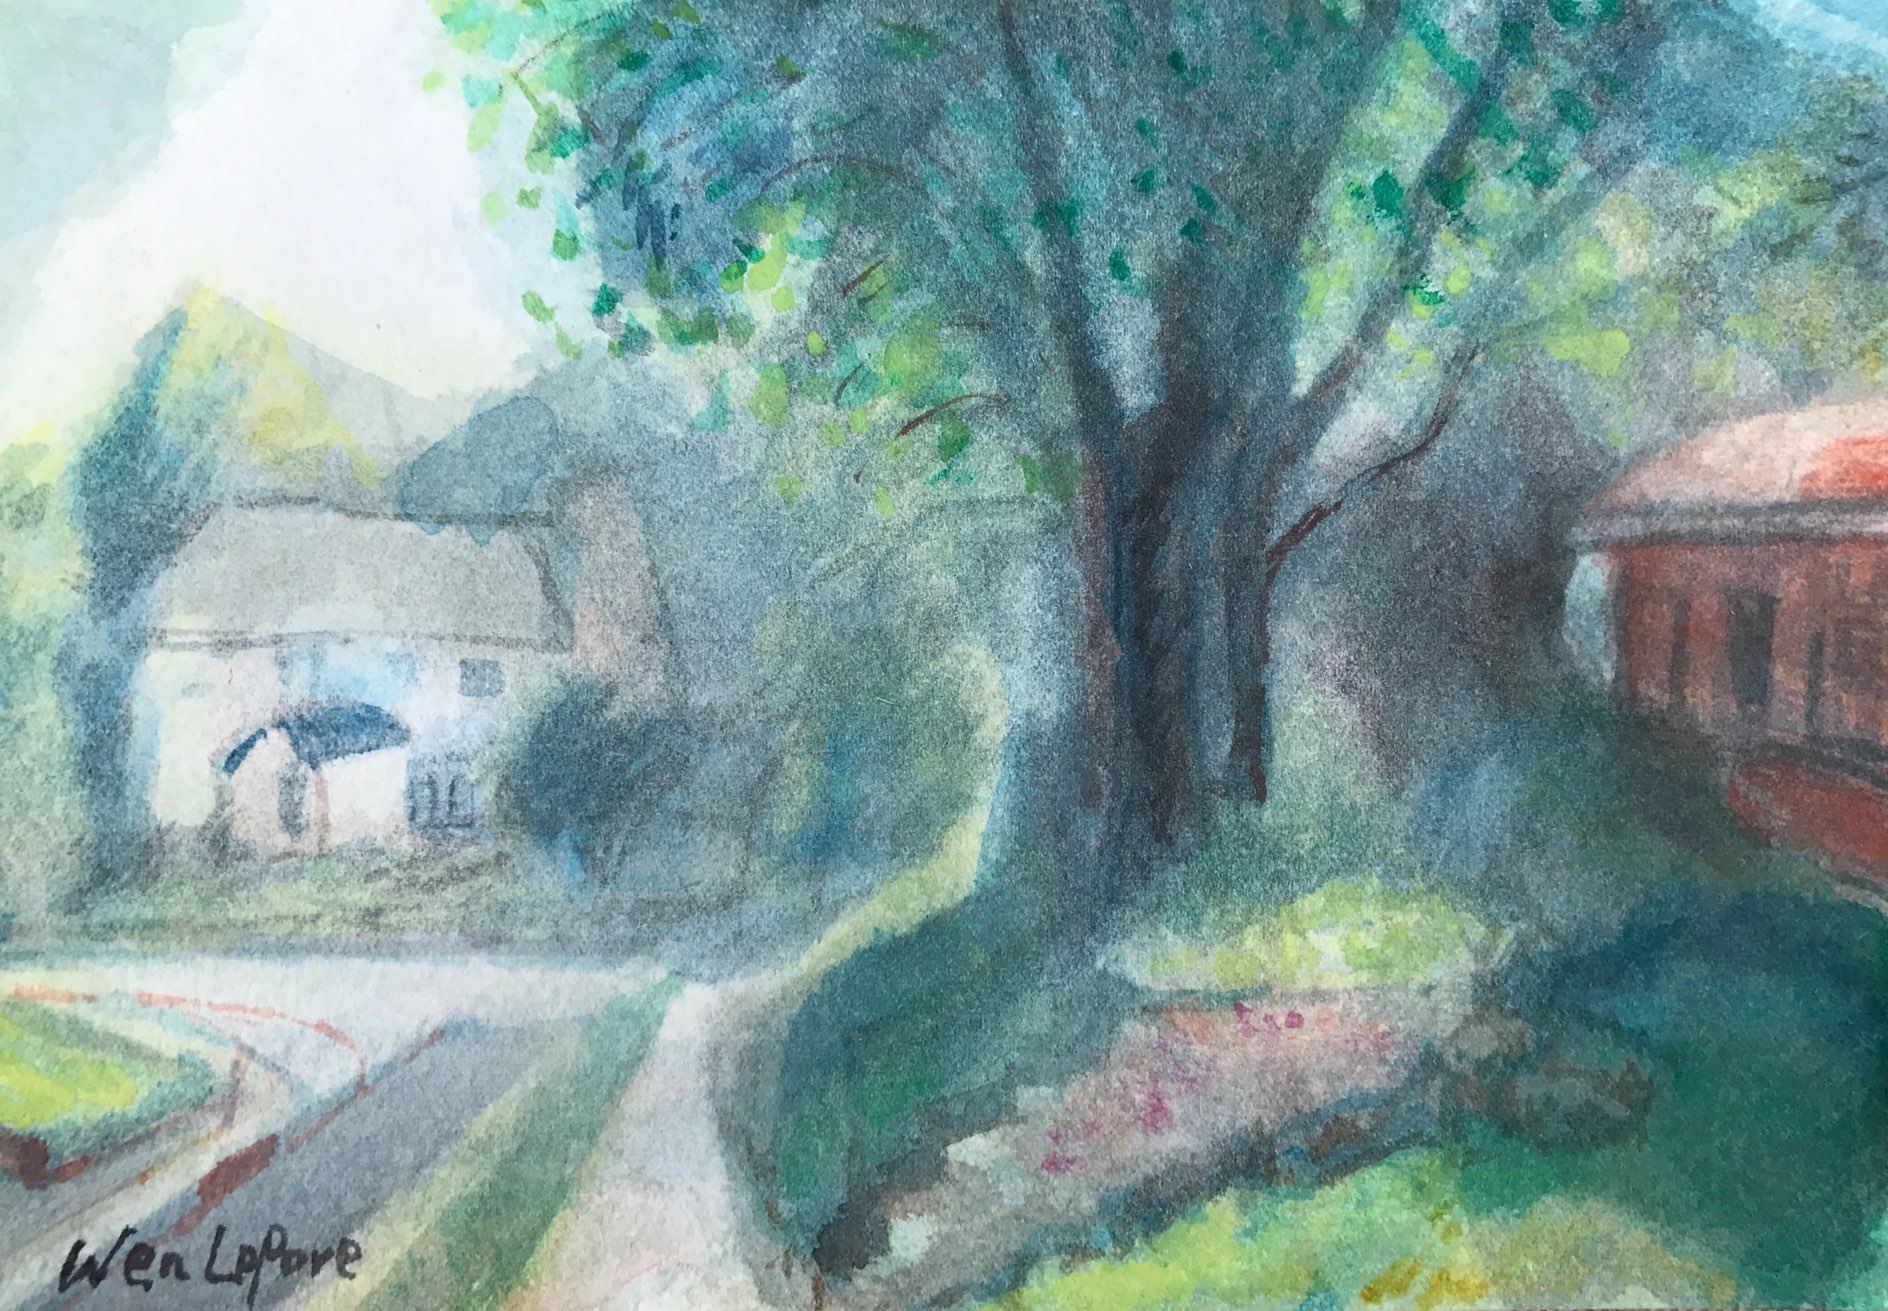 https://0901.nccdn.net/4_2/000/000/056/7dc/watercolor27.jpg